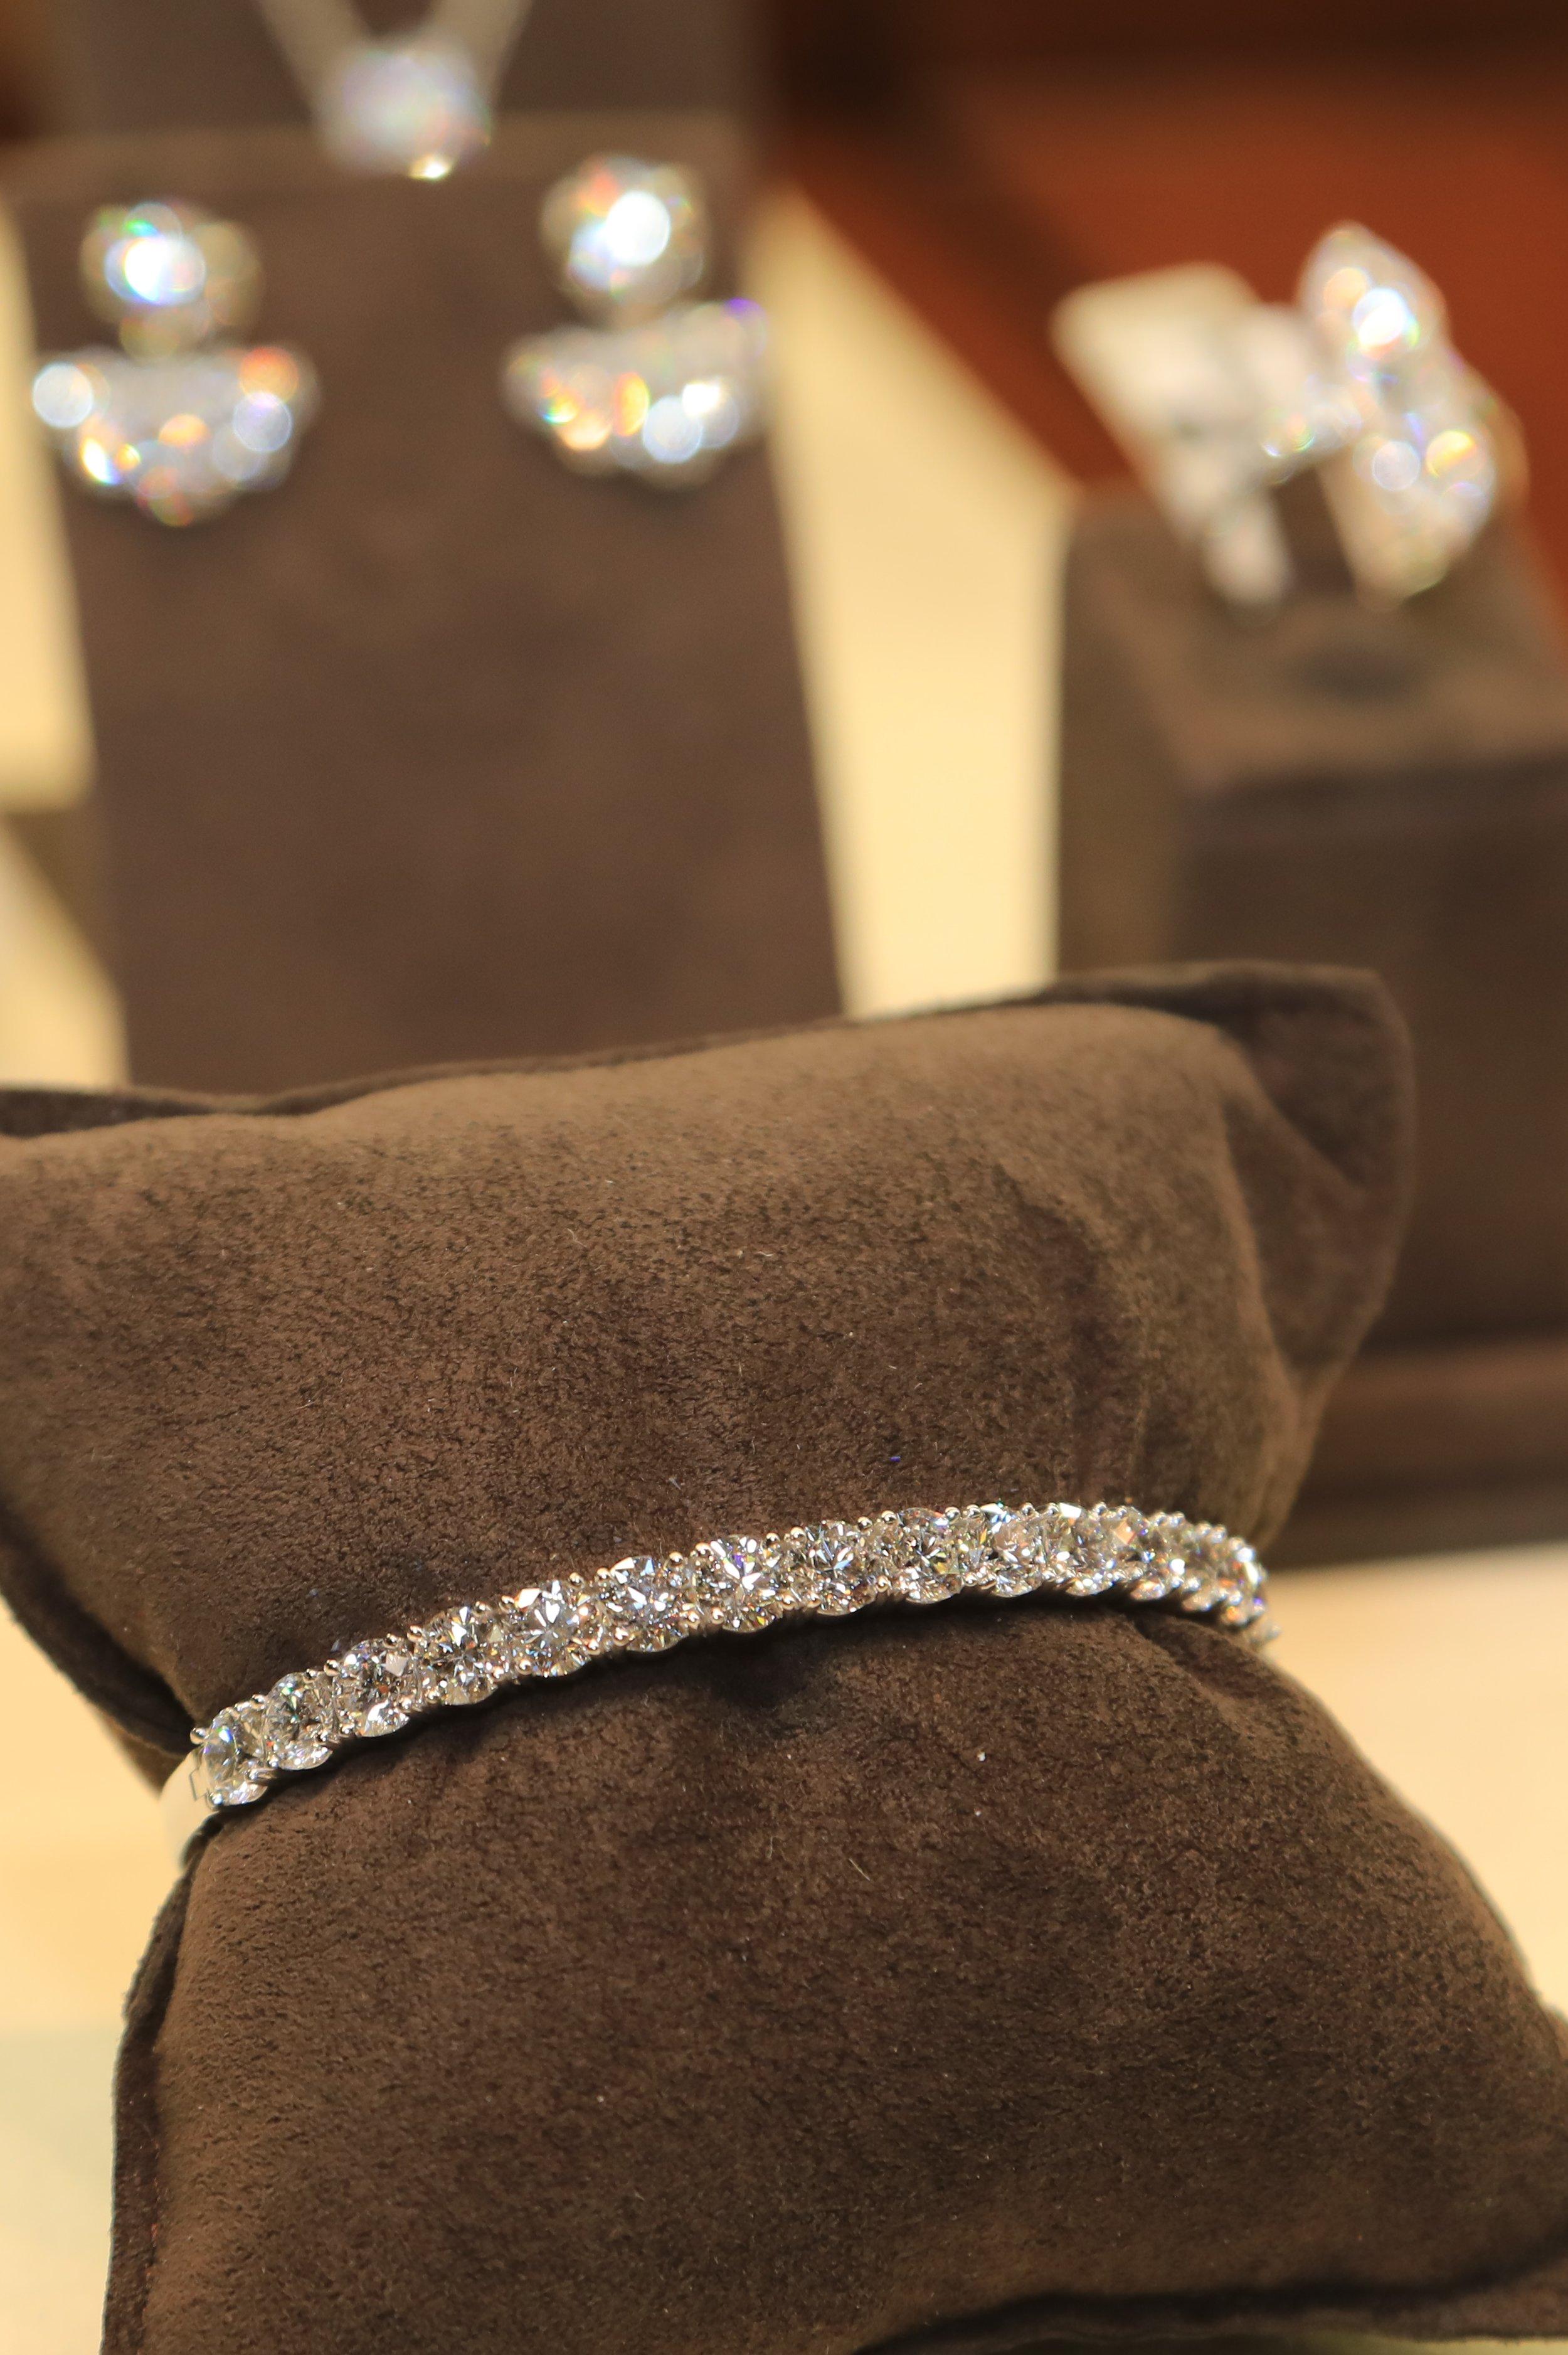 2018 Simon Jewelers Humane Society 022.JPG